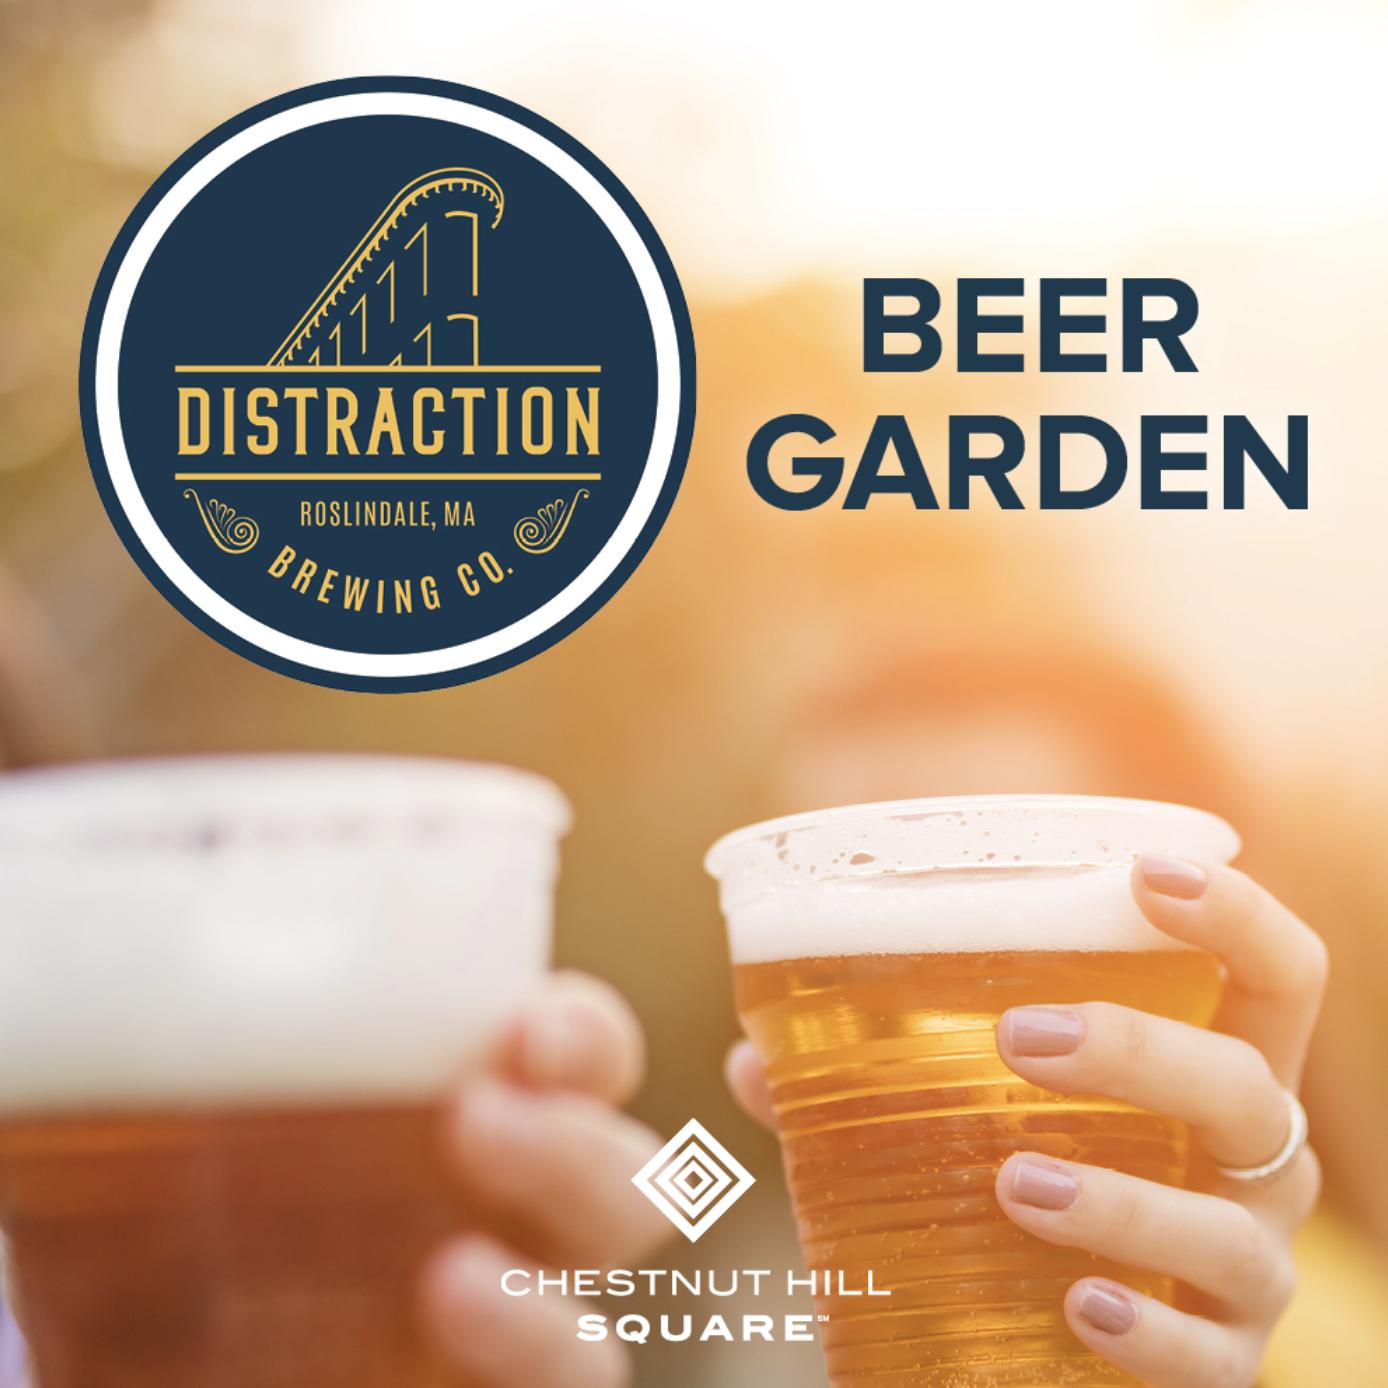 Chestnut Hill Square Beer Garden